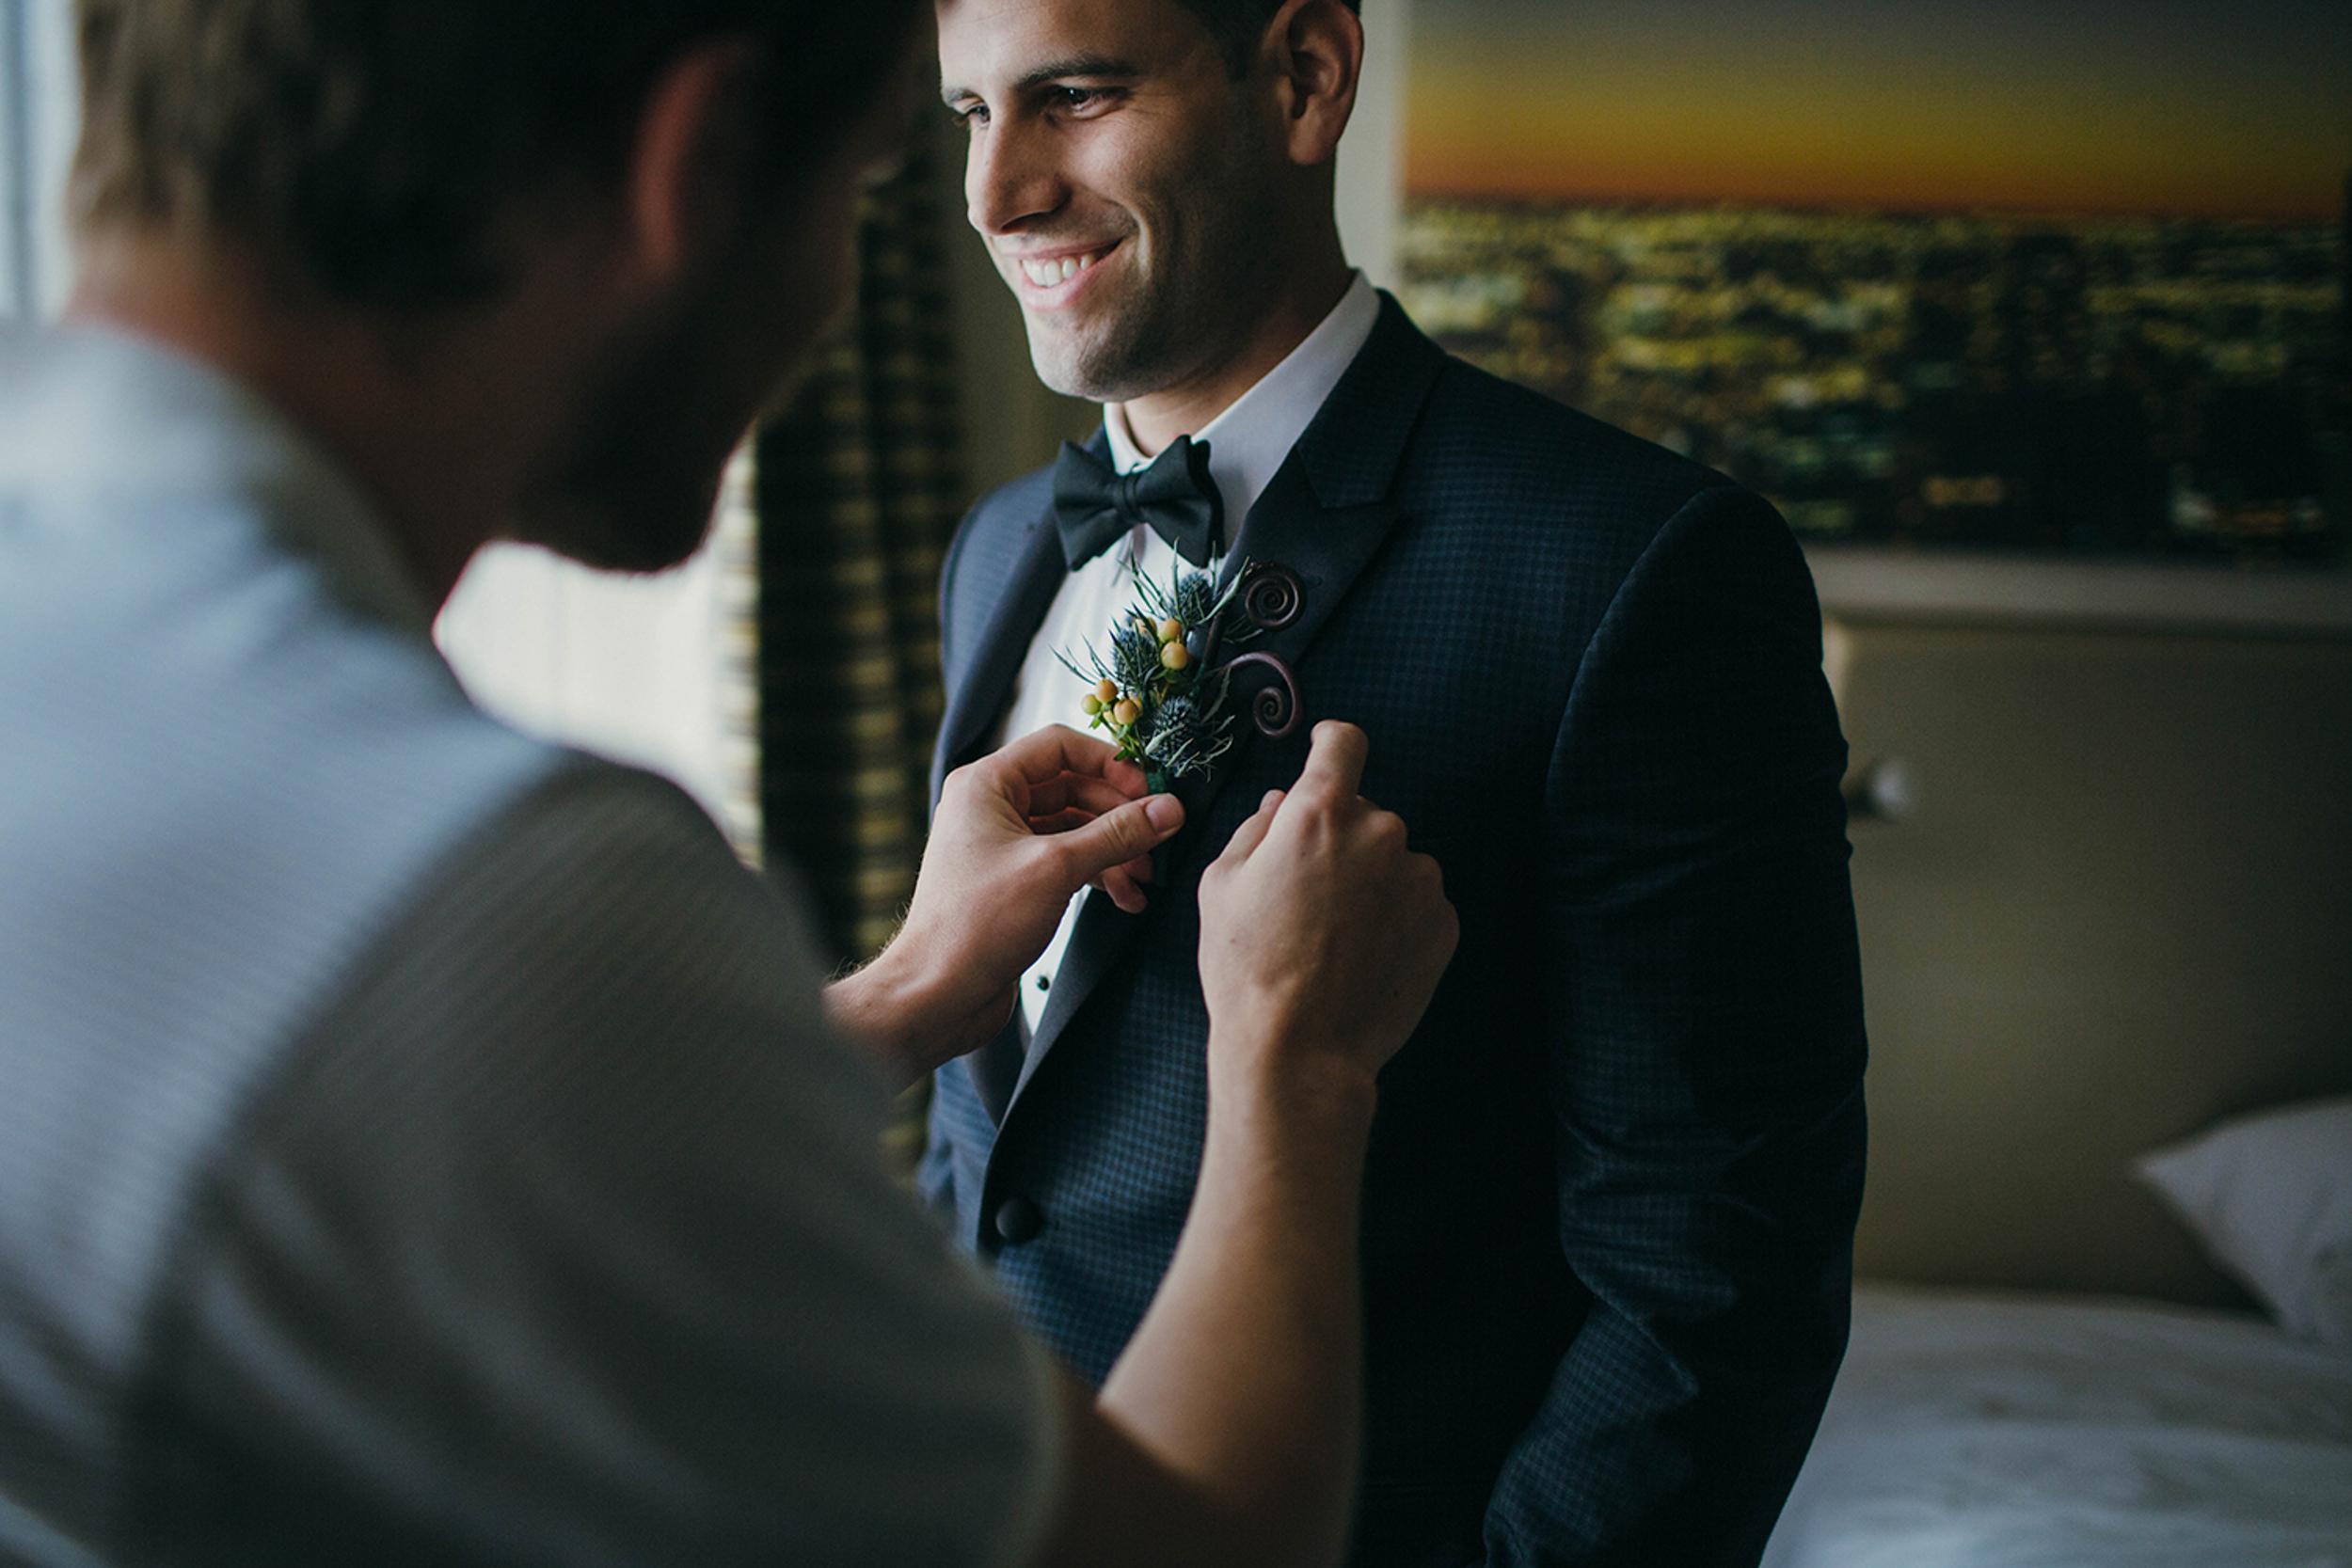 chicago.wedding.urban.intimate.zed451.lake.milton olive park-21.jpg